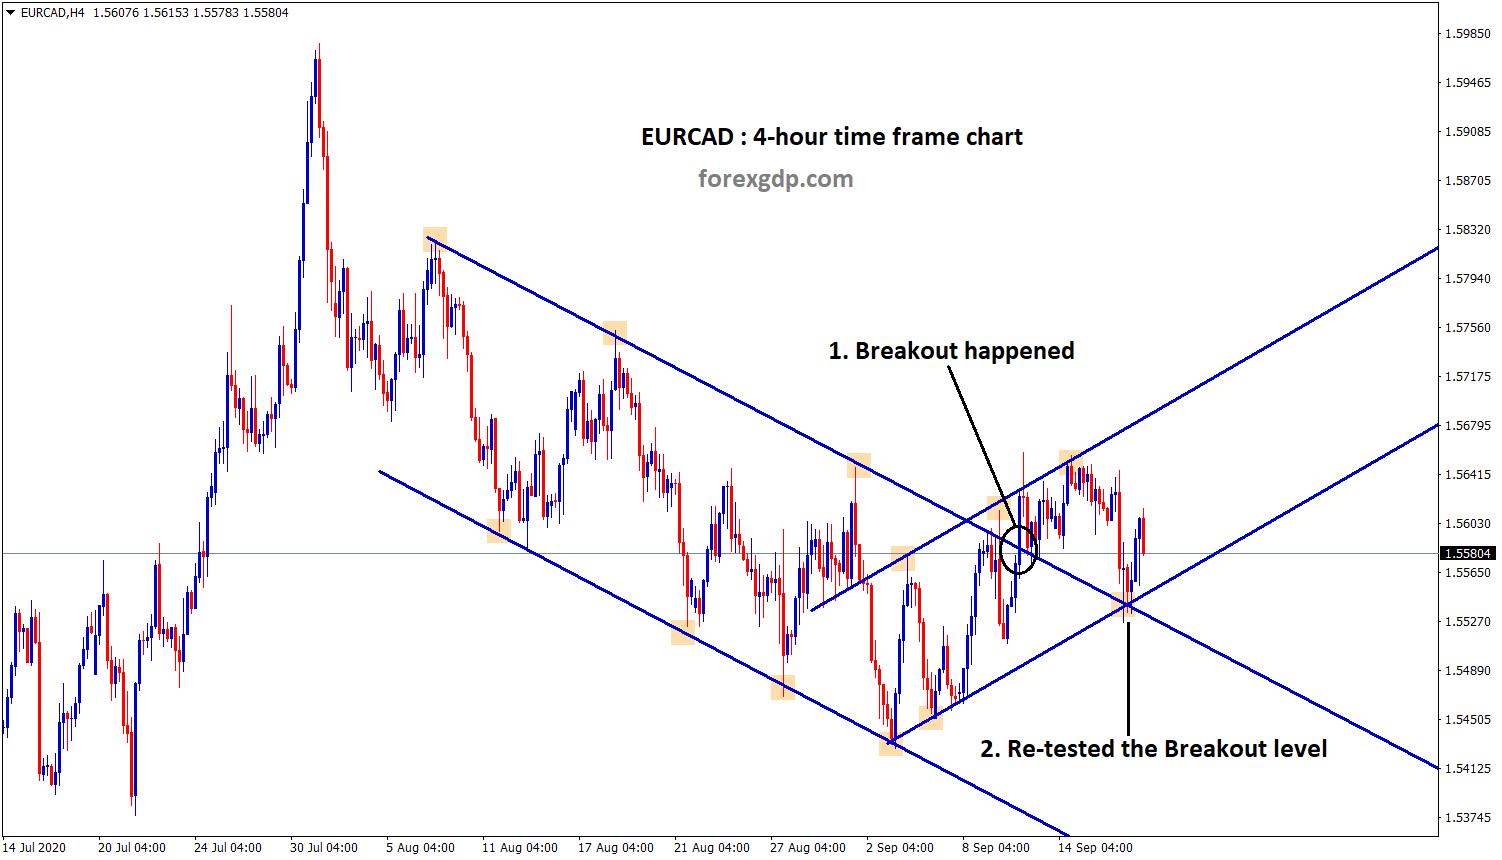 Breakout and retest happen in EURCAD h4